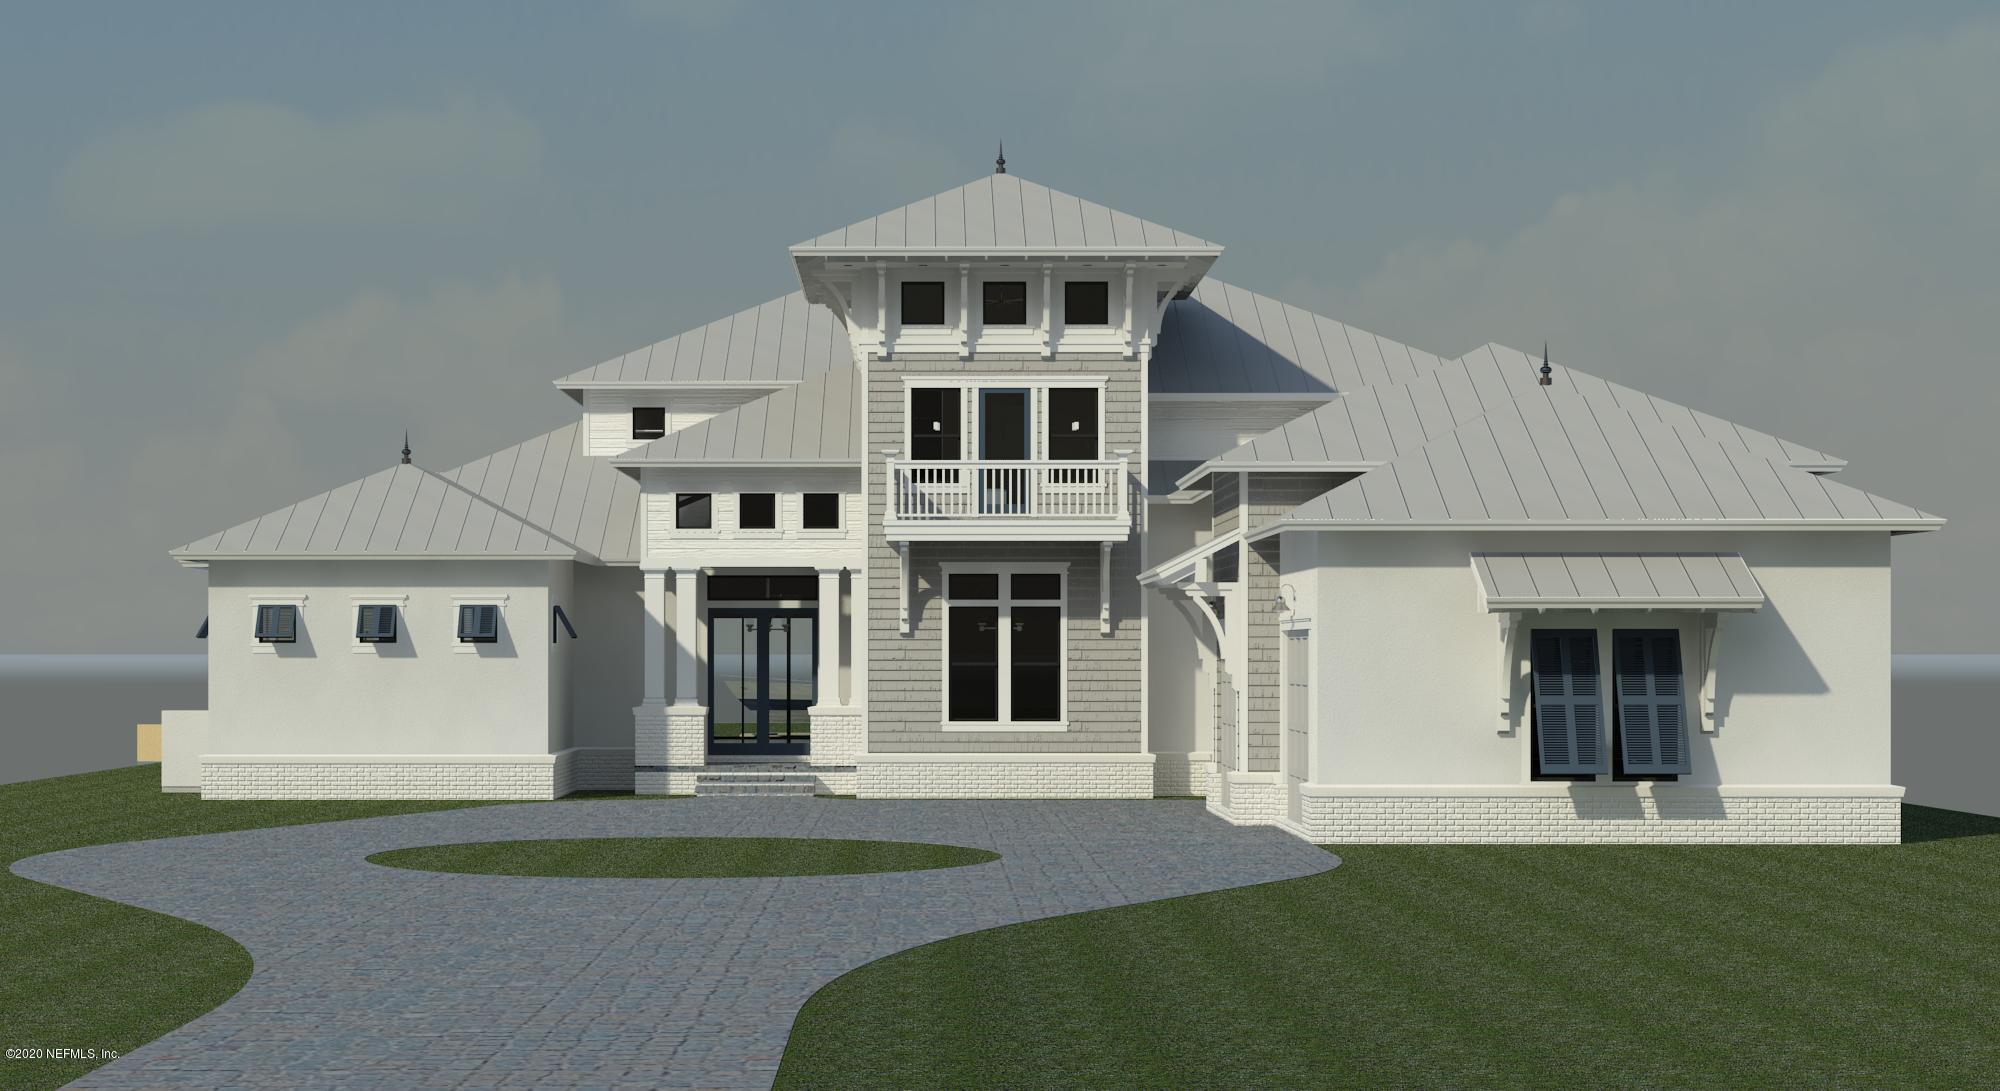 129 HARBOURMASTER, PONTE VEDRA BEACH, FLORIDA 32082, 3 Bedrooms Bedrooms, ,3 BathroomsBathrooms,Residential,For sale,HARBOURMASTER,1079237